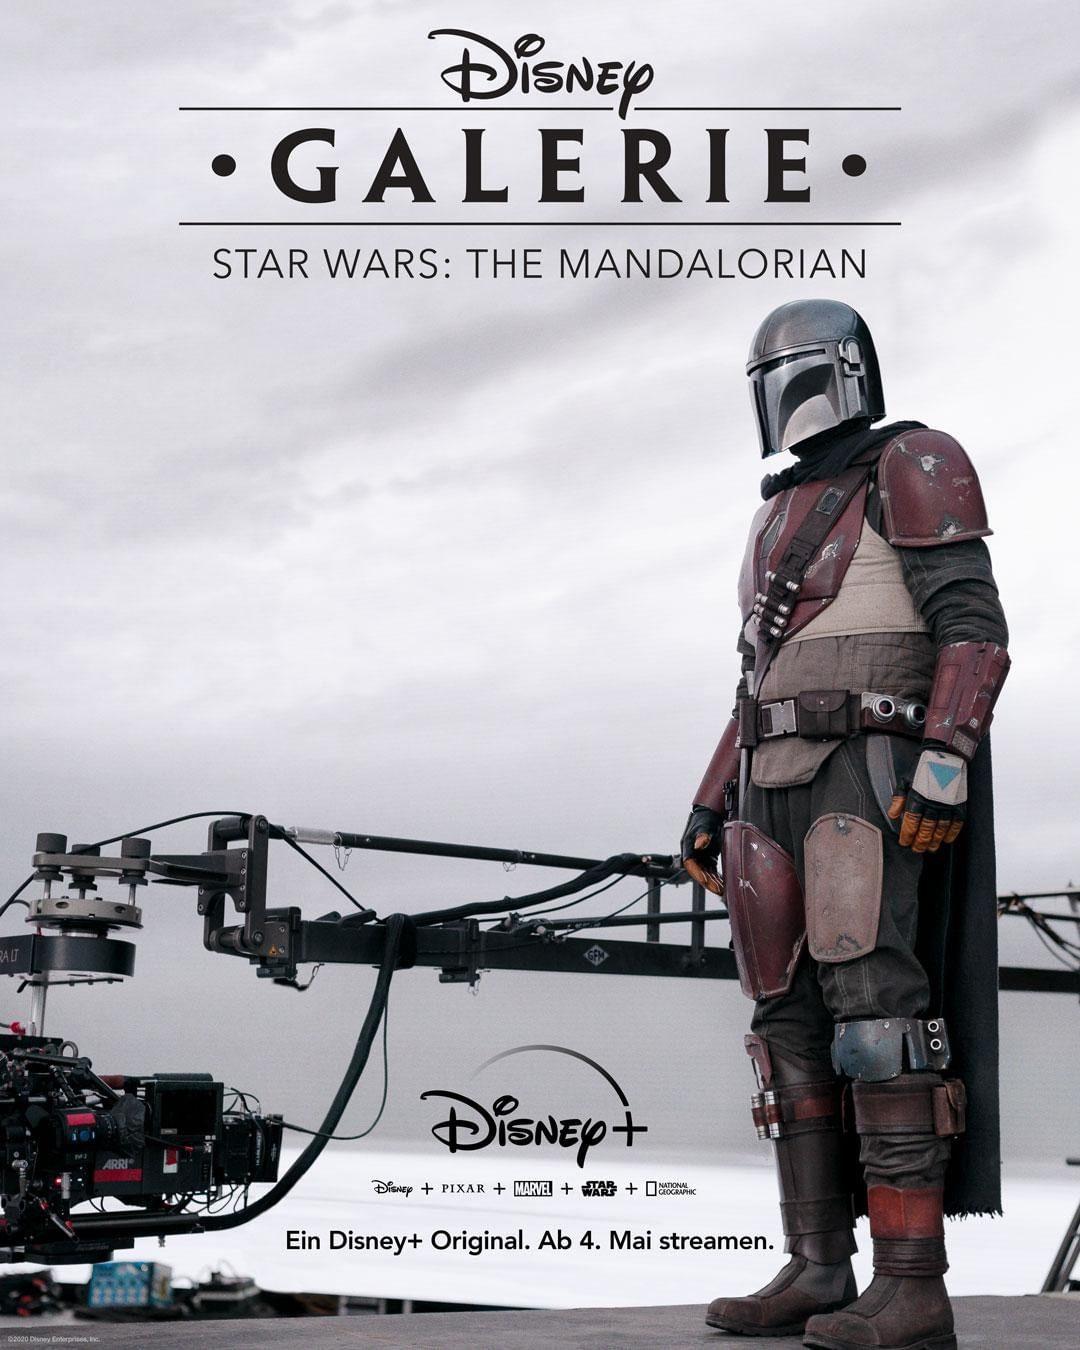 Disney Galerie – The Mandalorian